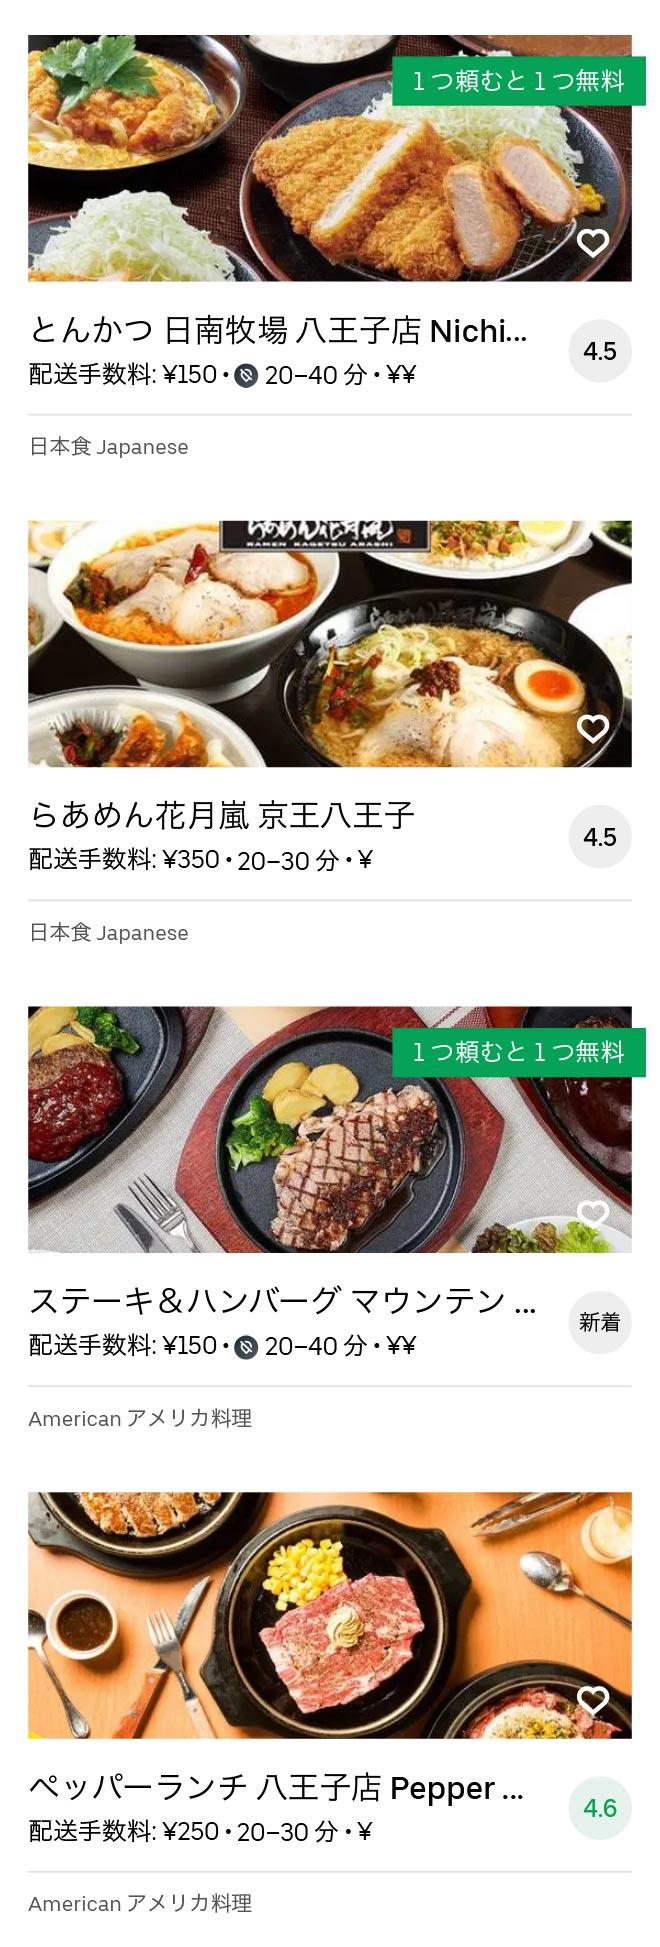 Nishi hatioji menu 2010 10